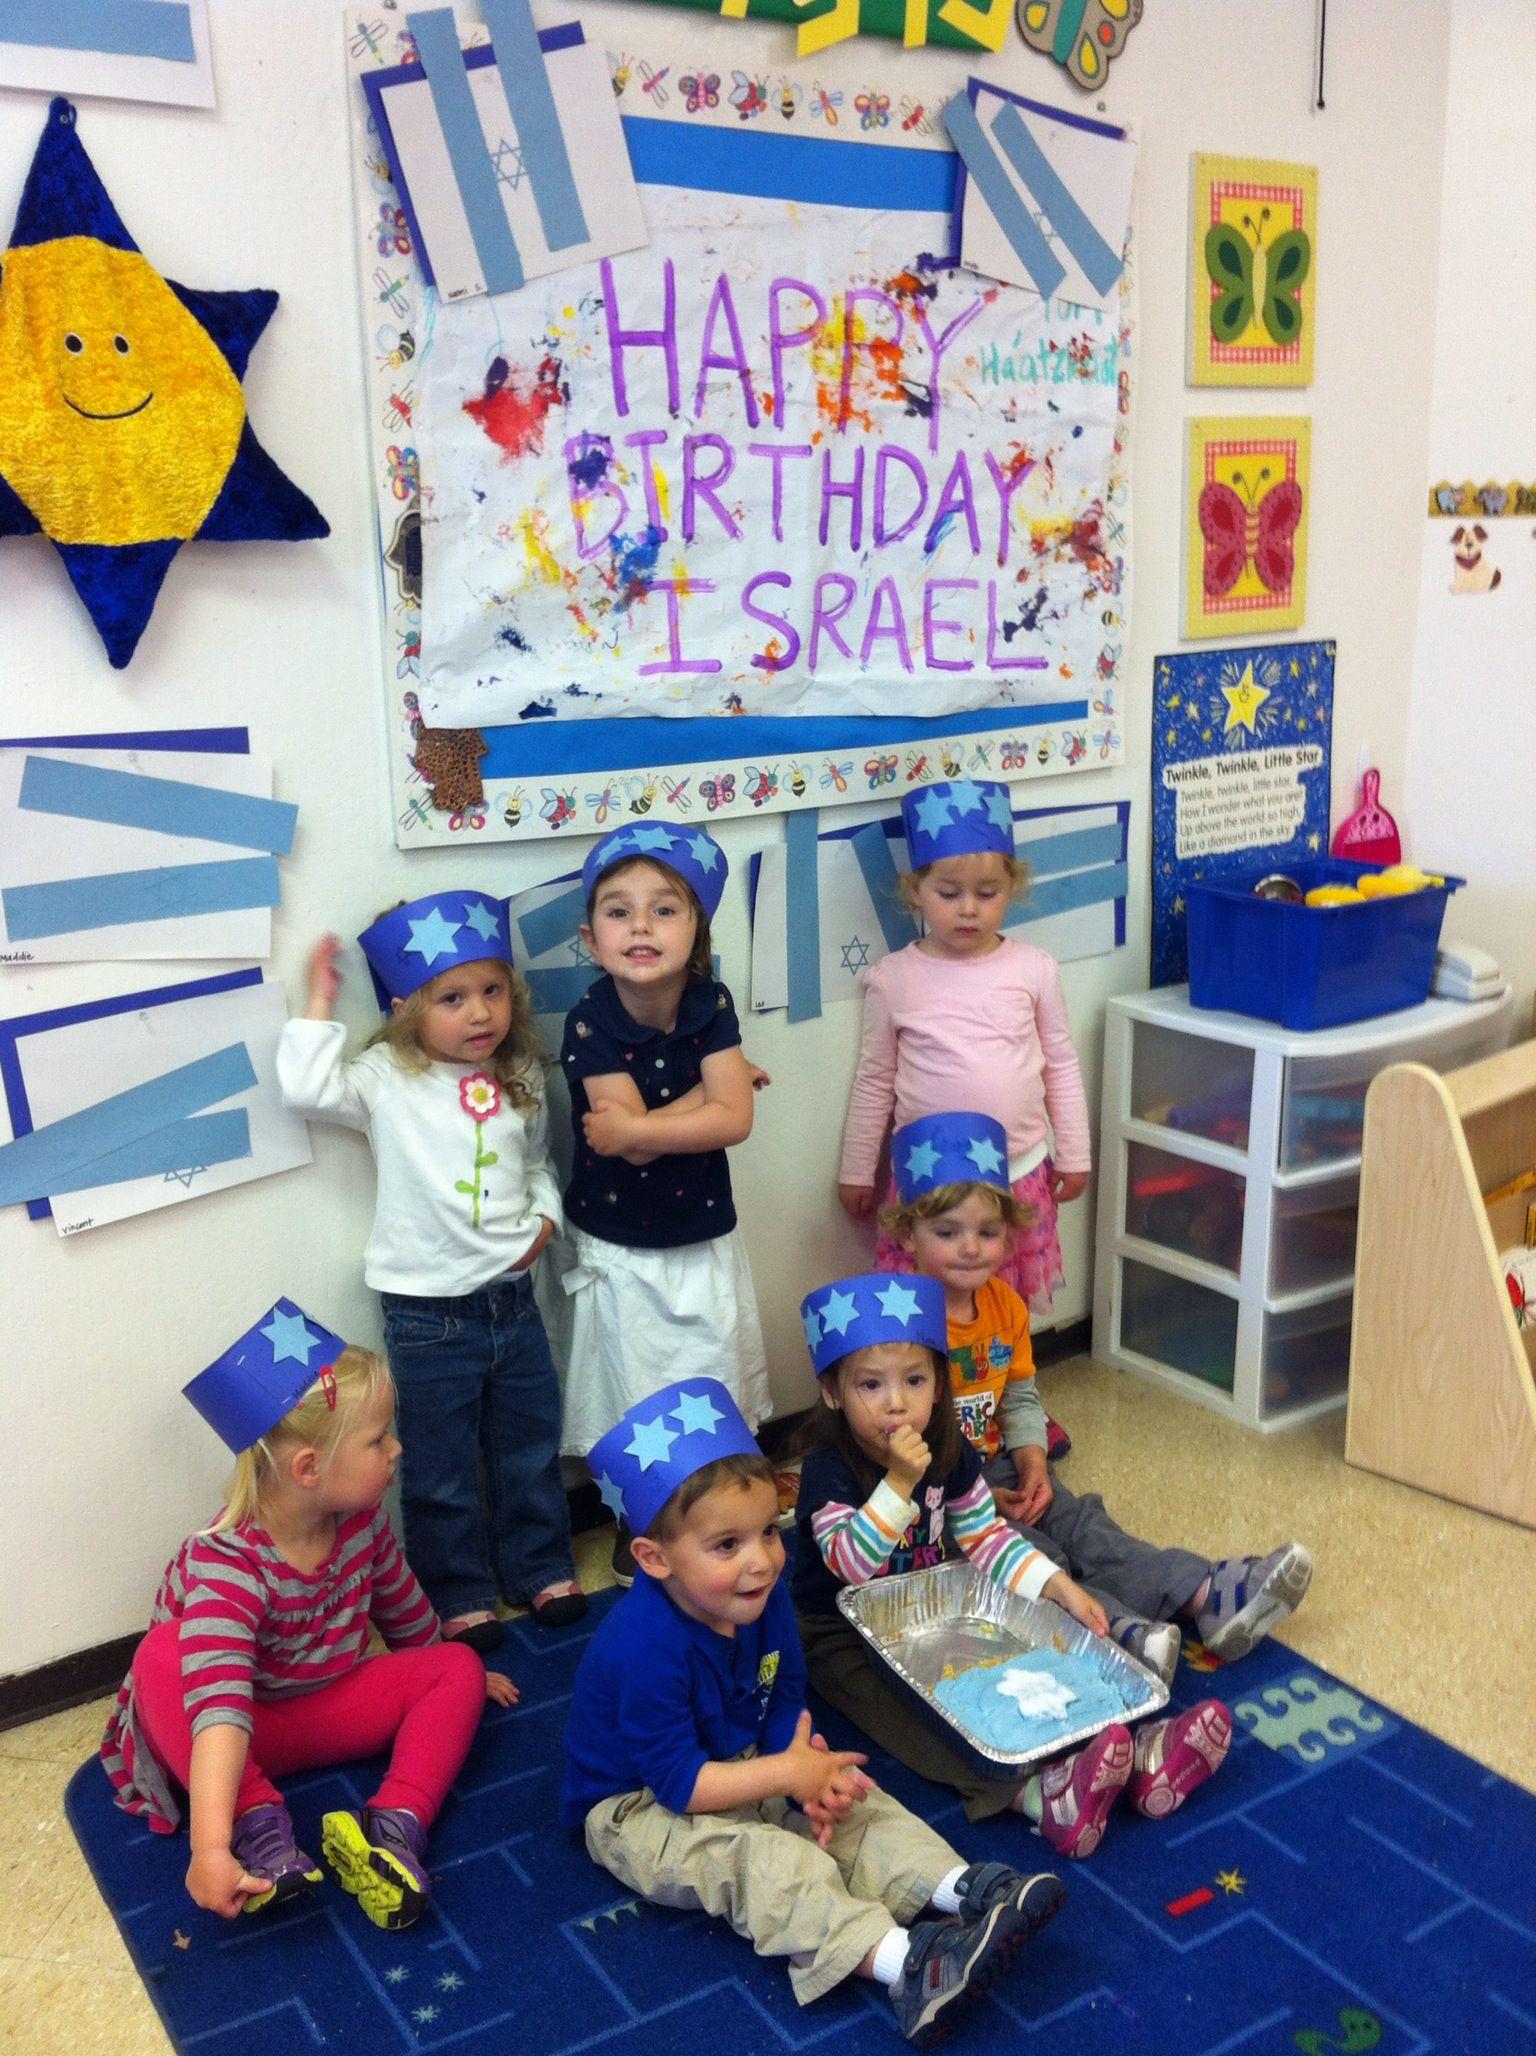 Happy Birthday Israel